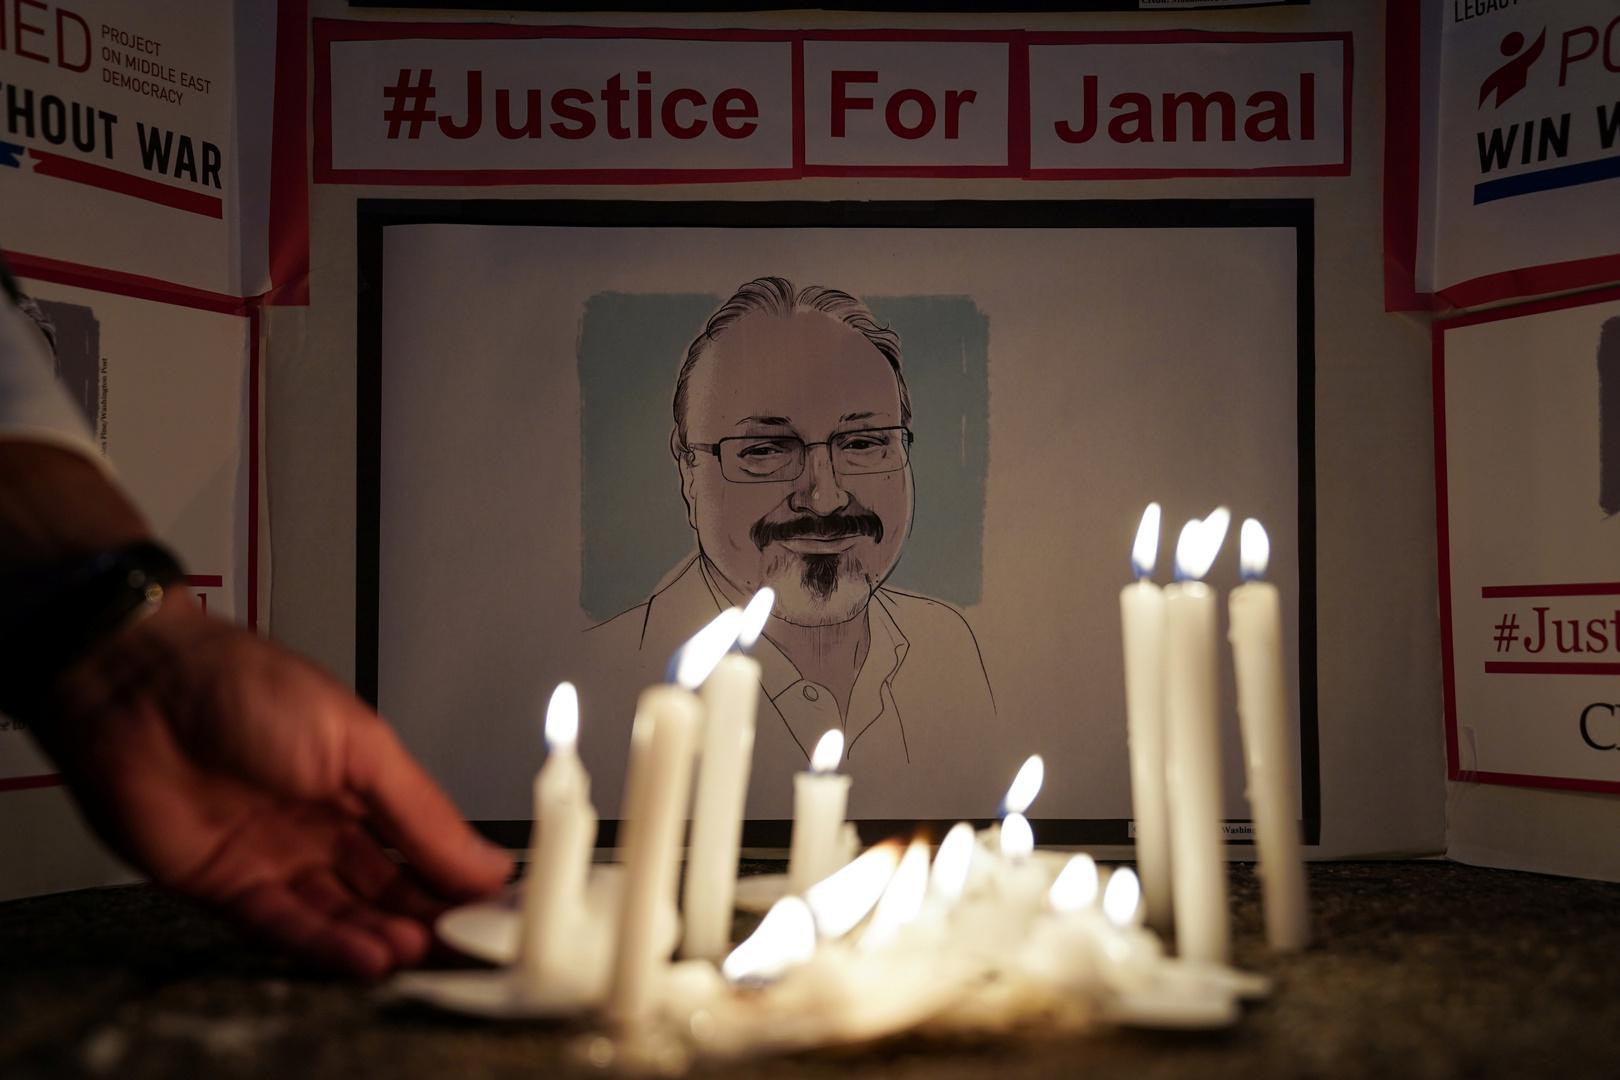 محكمة تركية تضيف متهمين سعوديين في محاكمة خاشقجي